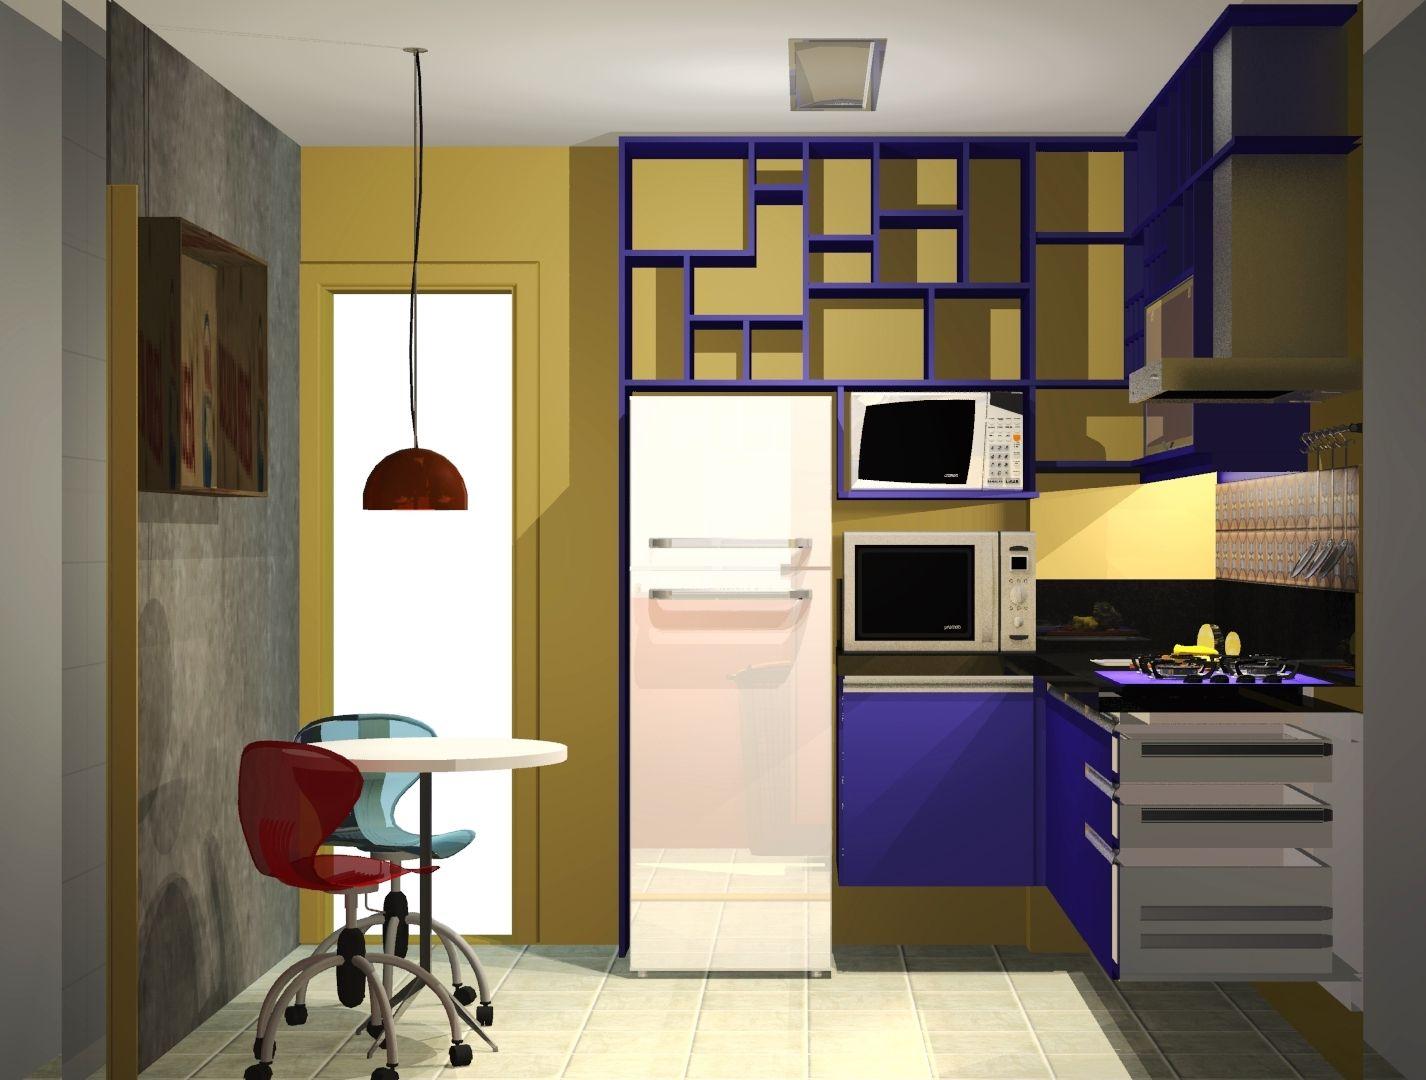 Purple and yellow kitchen cozinha roxa e amarela projetos pinterest